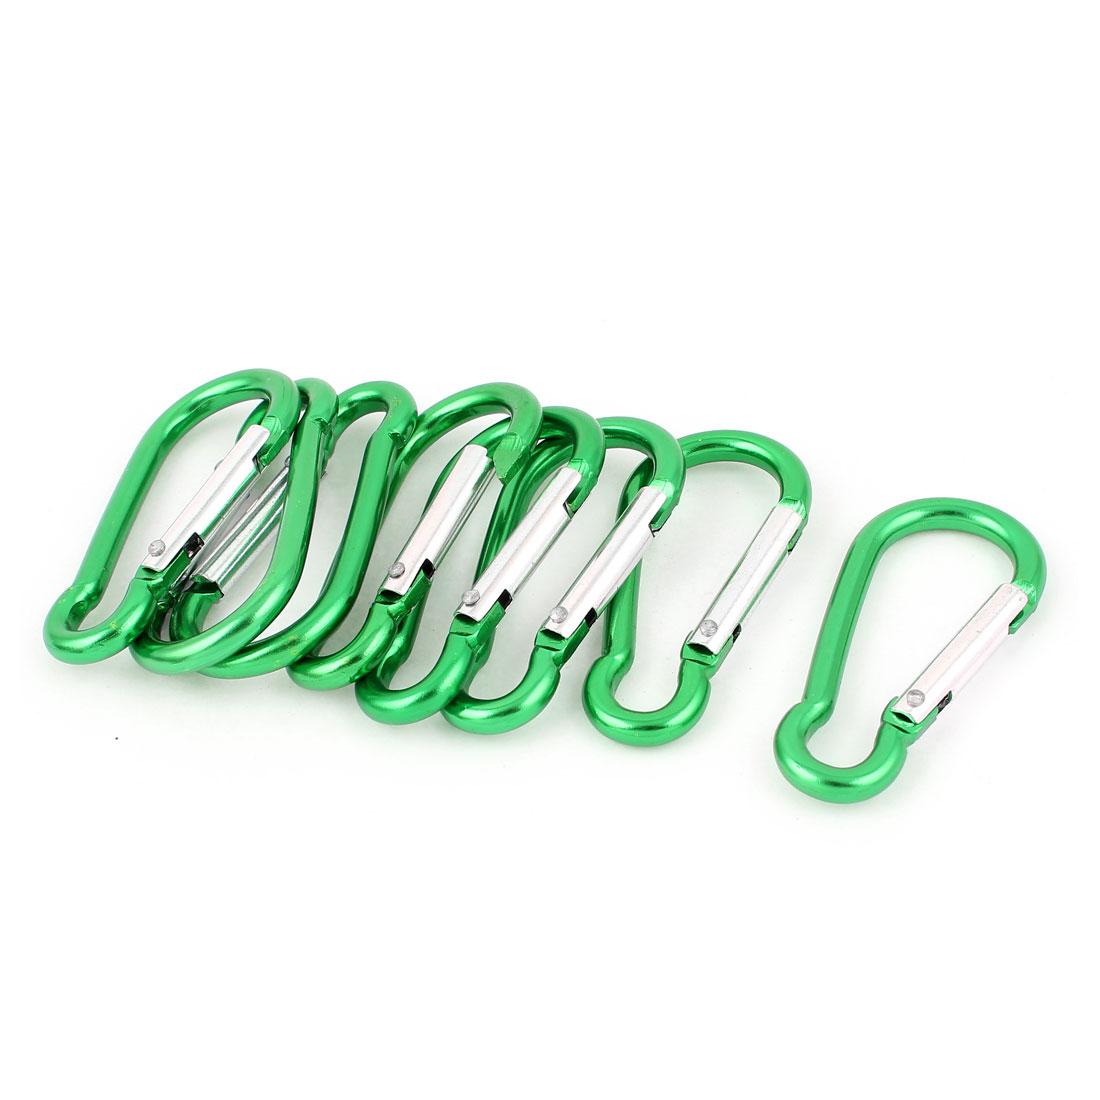 Cycling Hiking Spring Clip Snap Carabiner Hook Keychain Karabiner Bottle Holder 8pcs Green